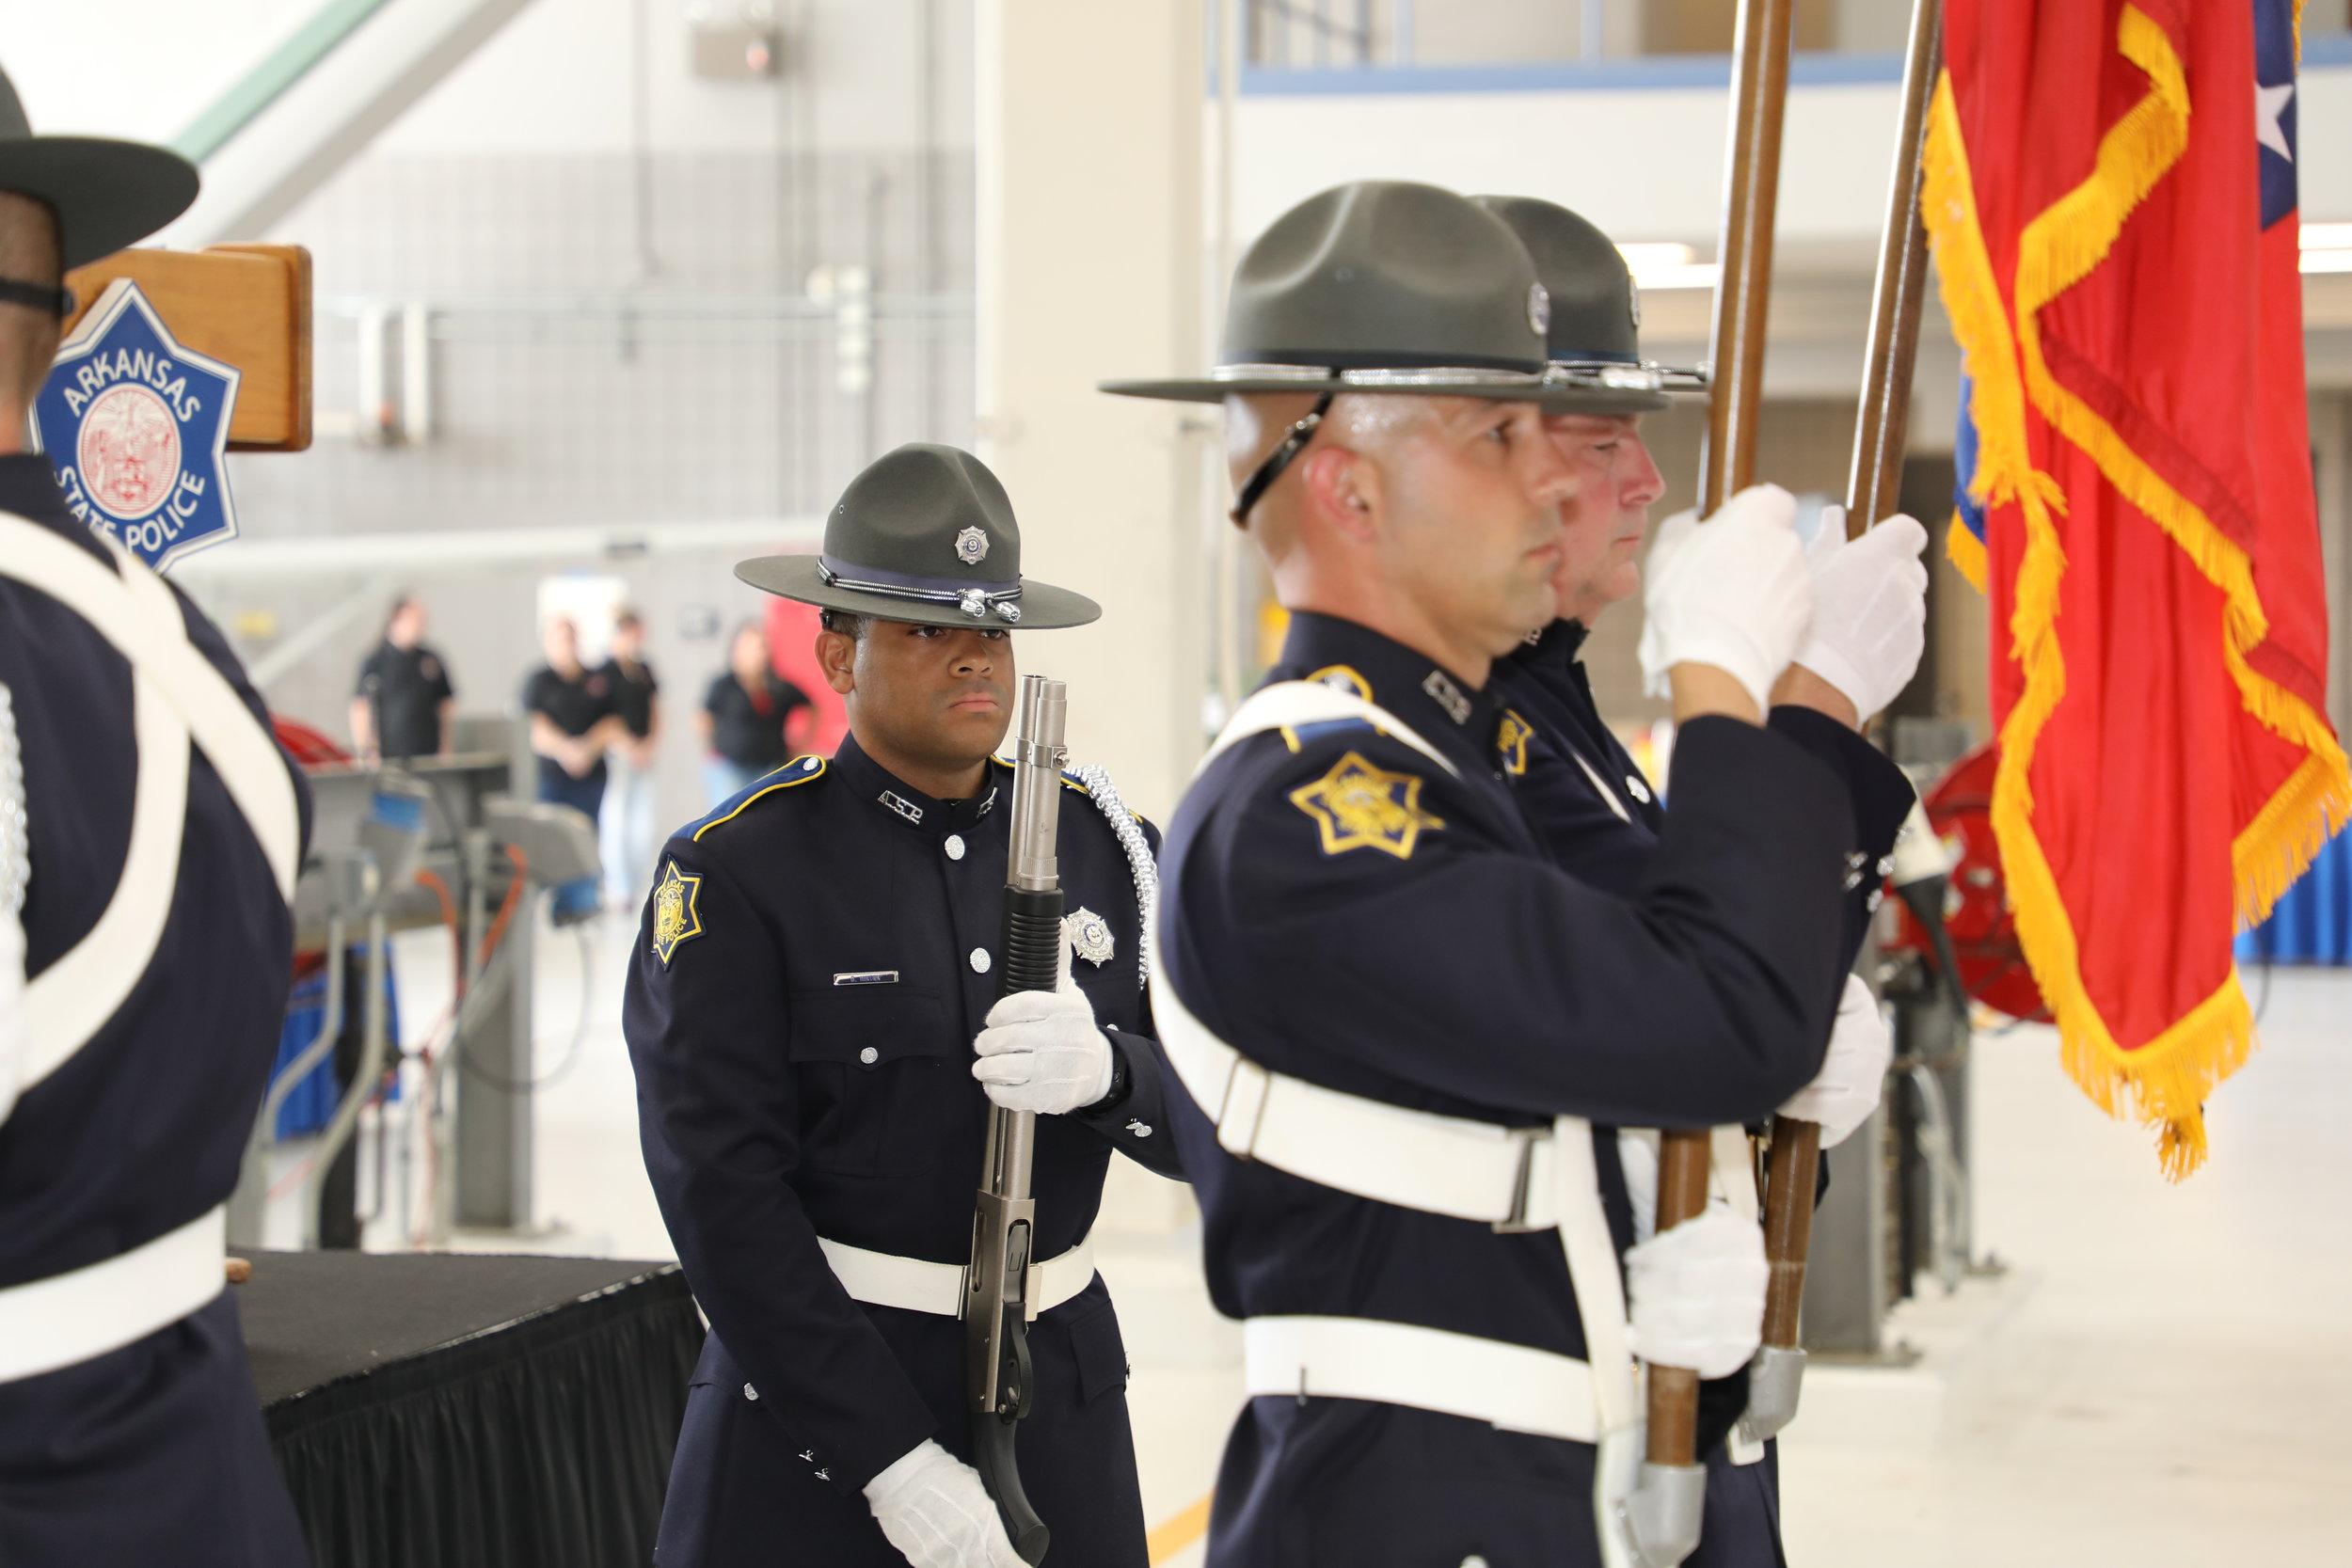 ASP Annual Awards Ceremony — Arkansas State Police Foundation